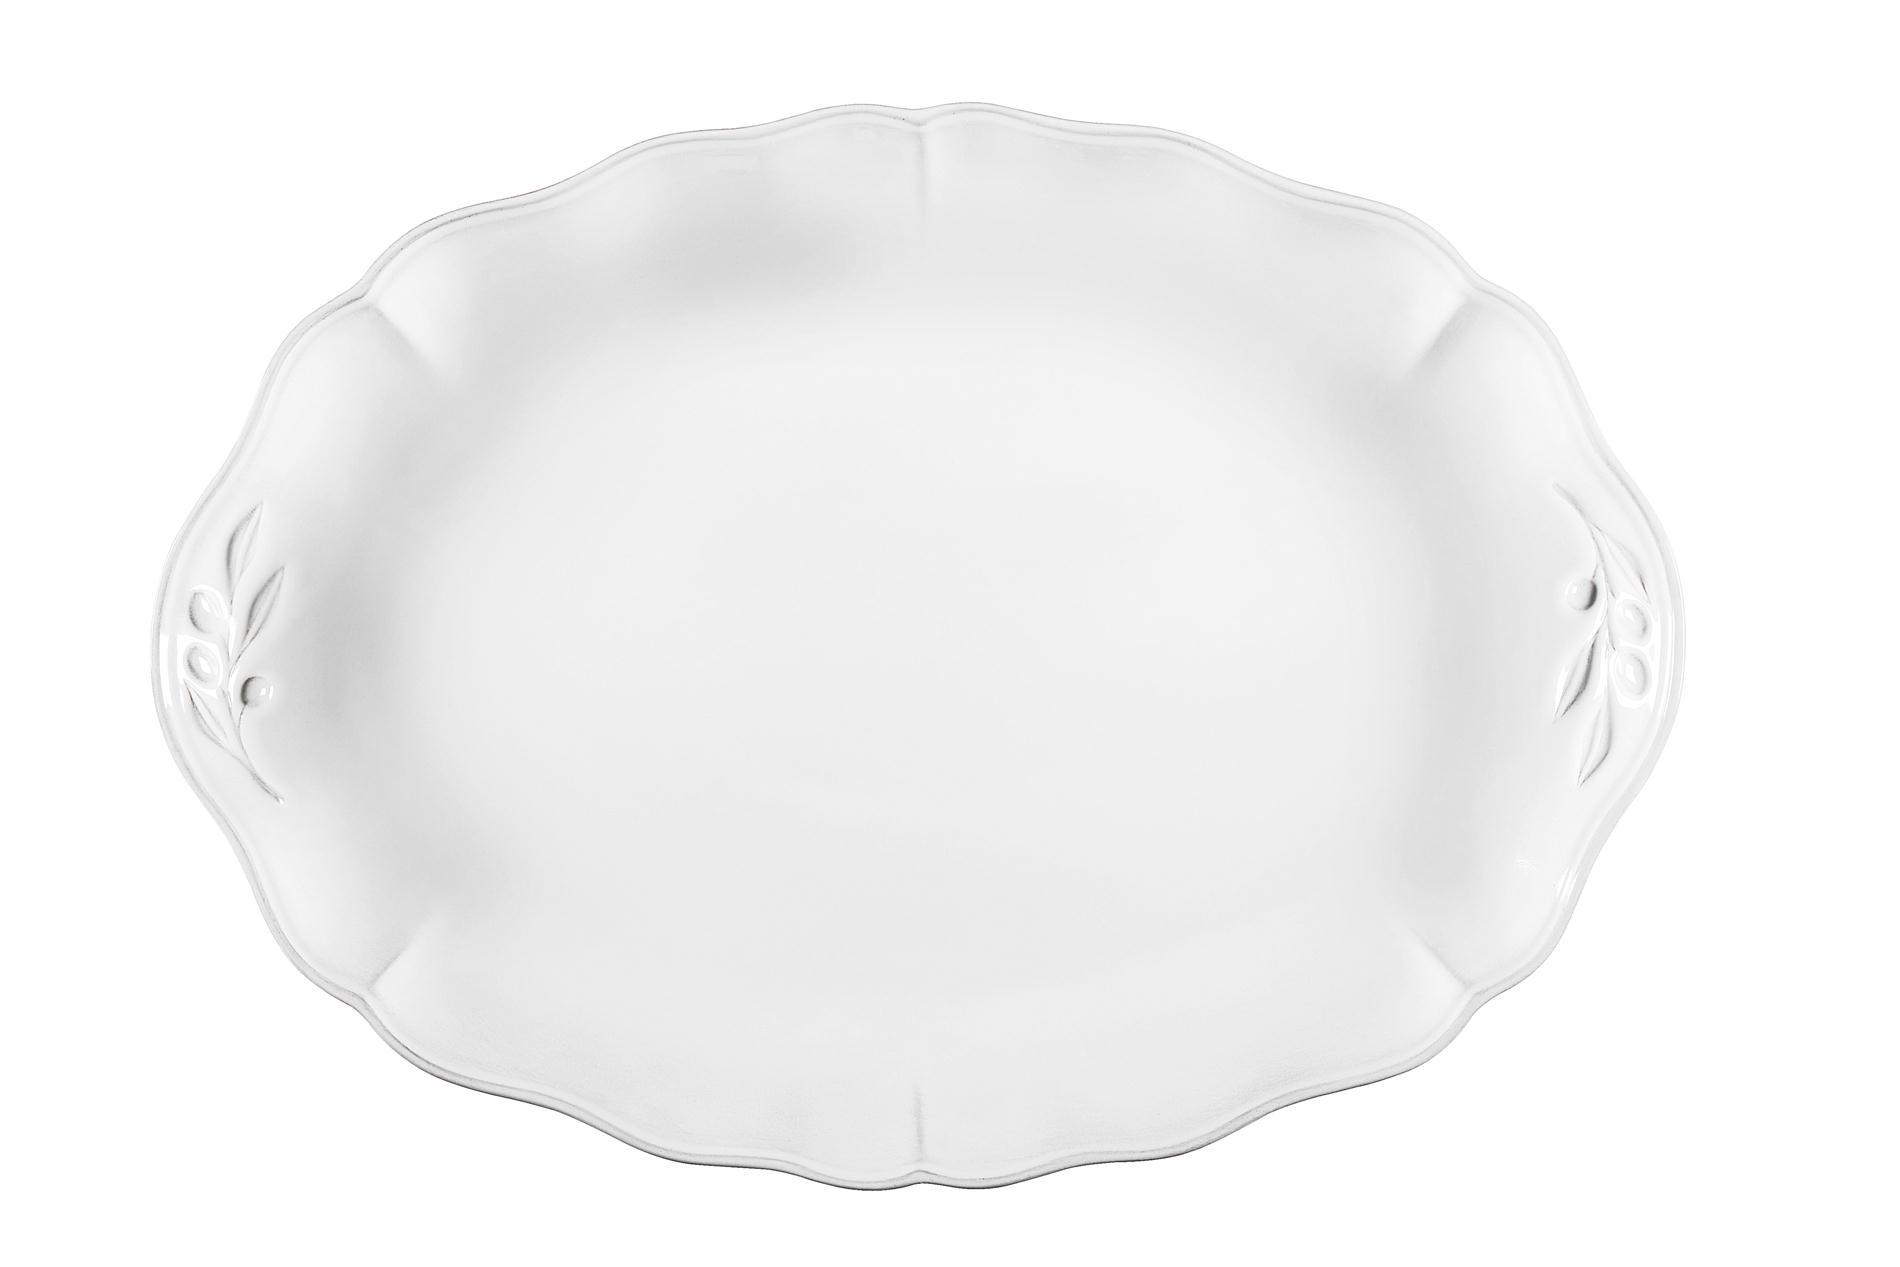 Ovale Platte Alentejo weiß, 40 cm